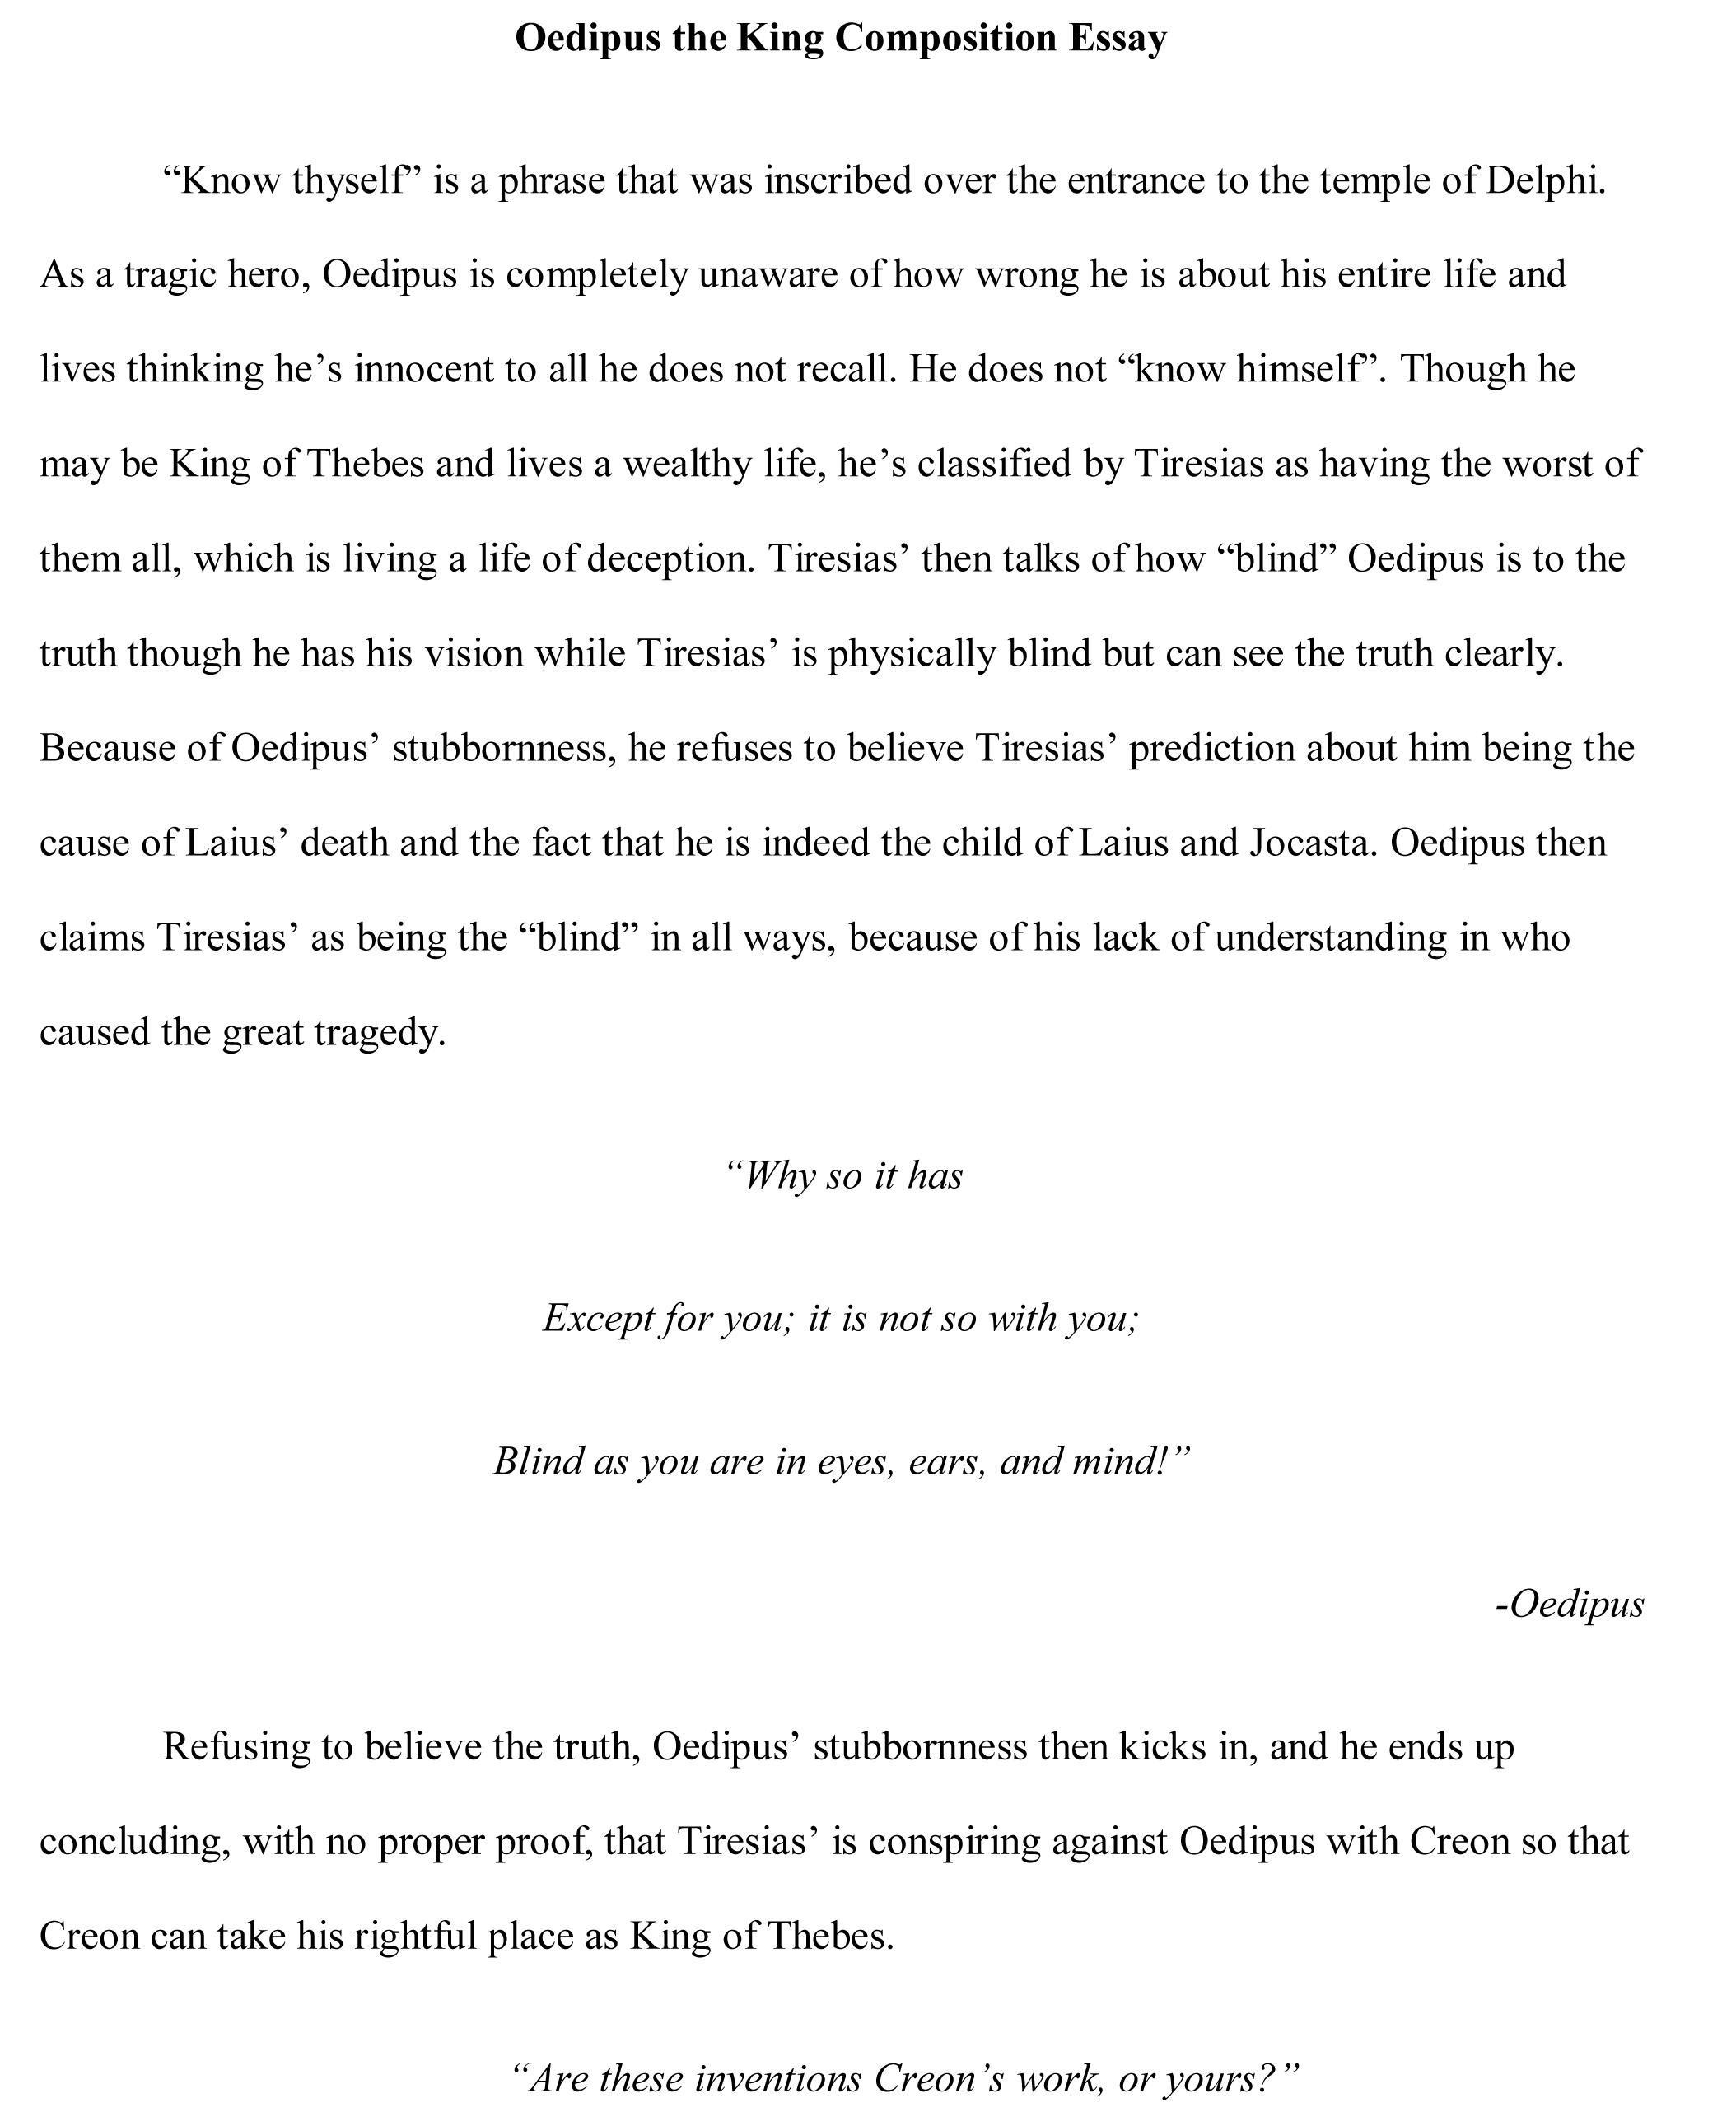 007 Best Essays Oedipus Essay Free Sample Breathtaking 2016 Personal College Australian Full